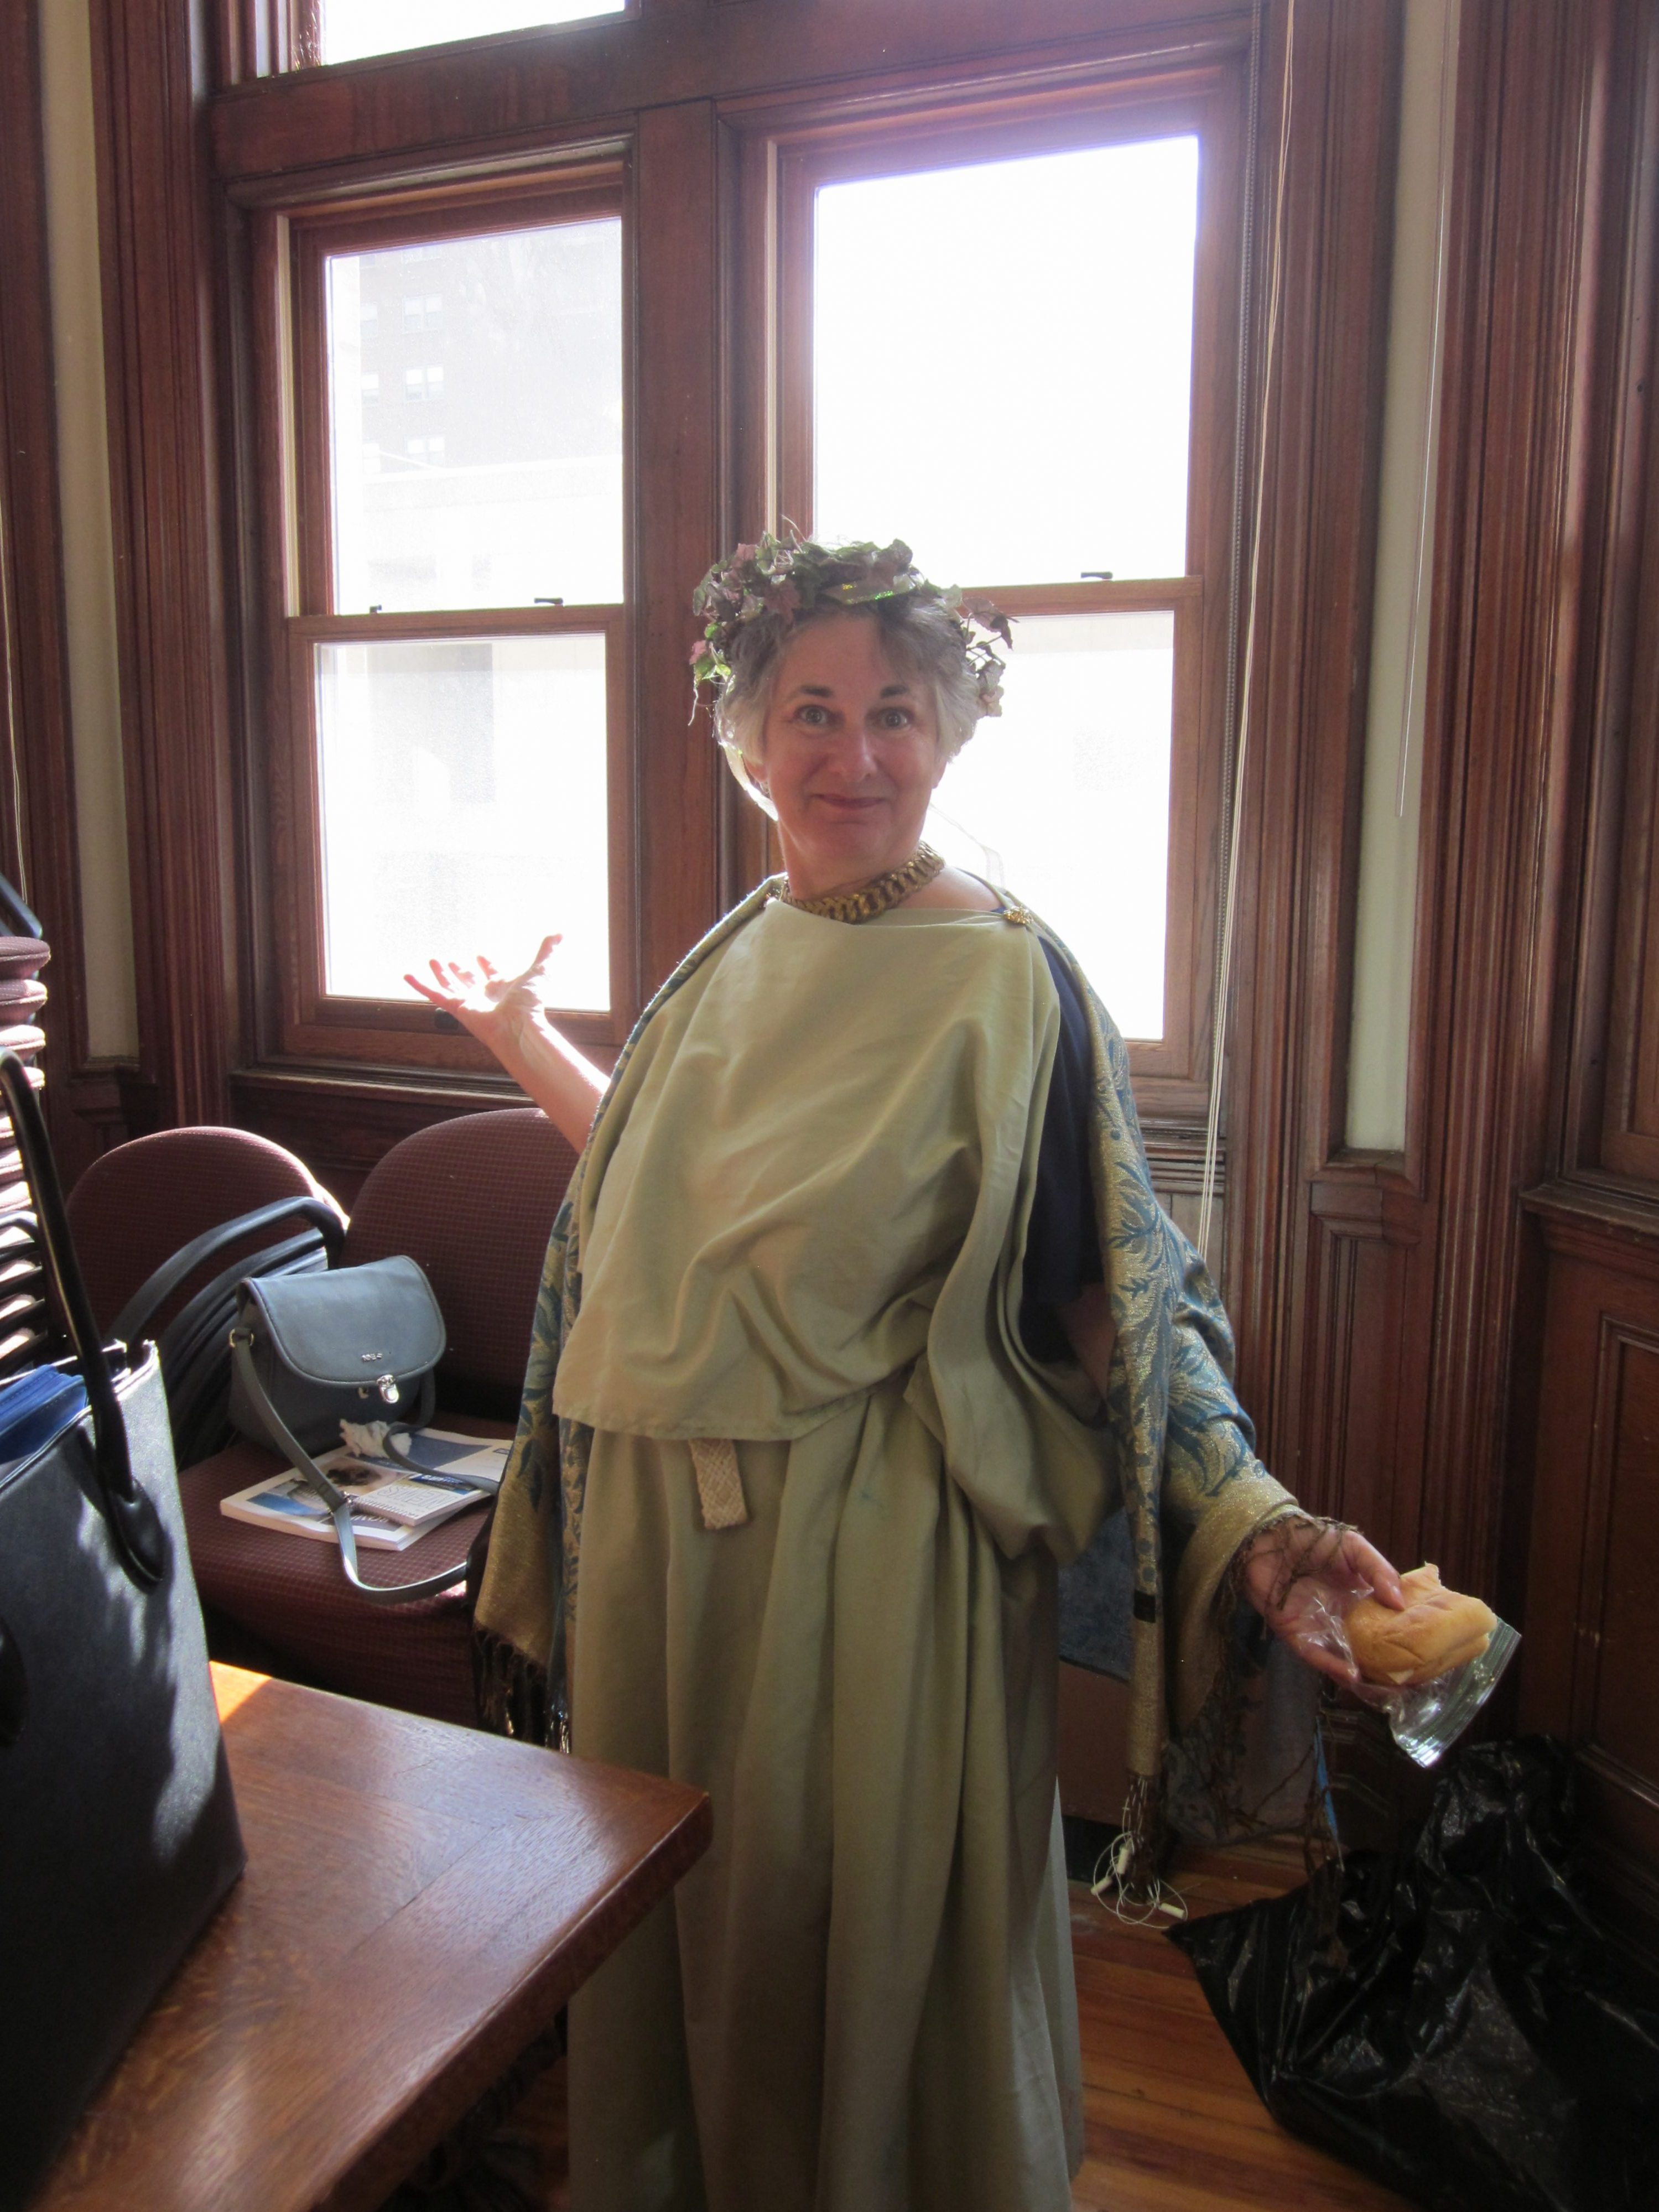 Professor Rachel Sternberg models a completed stola